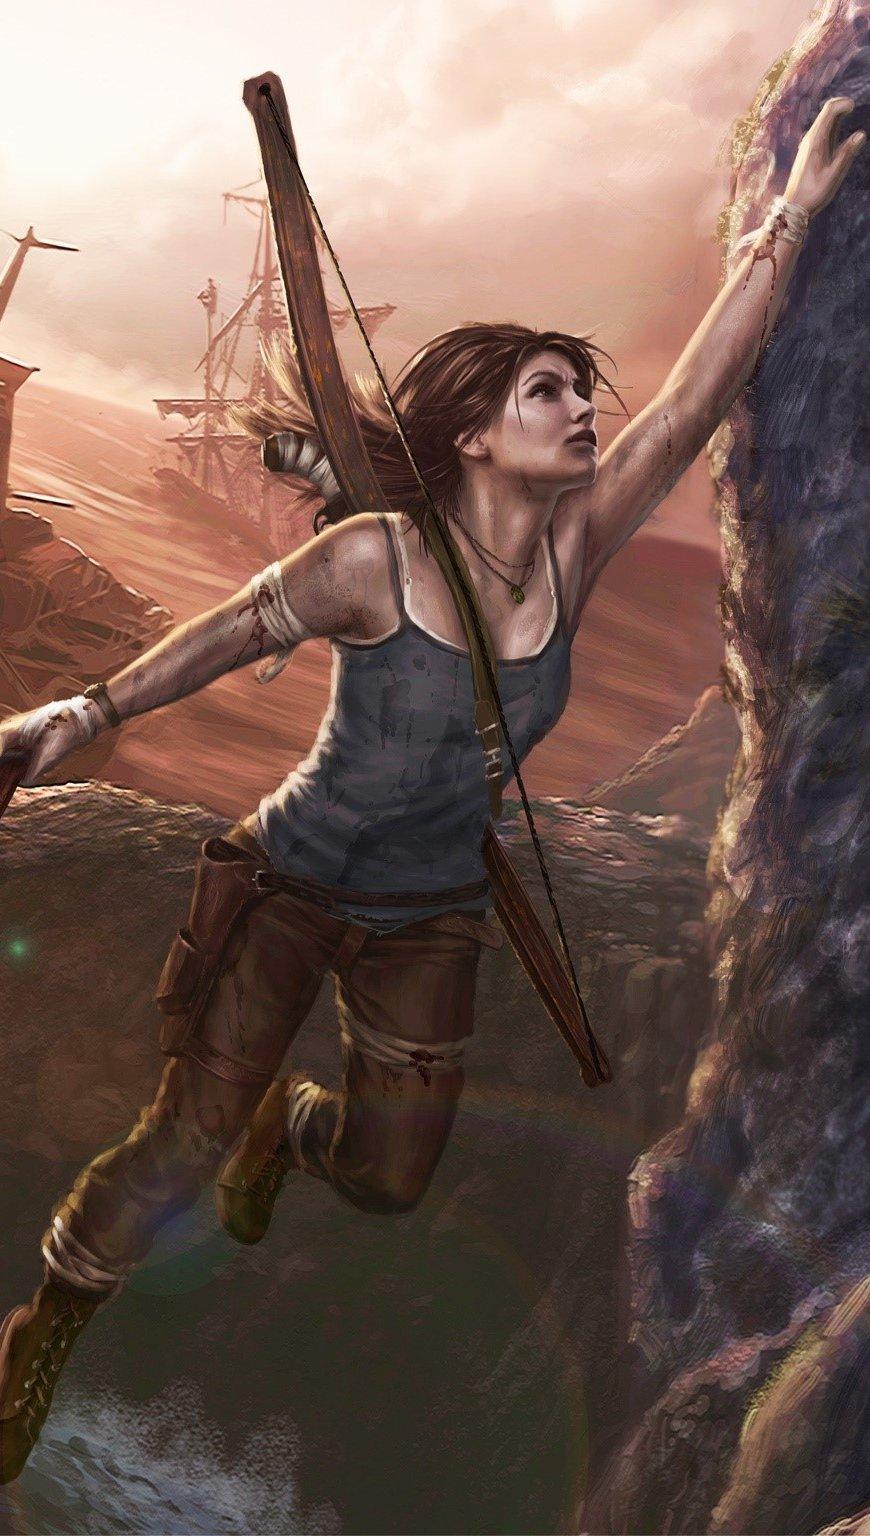 Wallpaper Lara Croft art Vertical